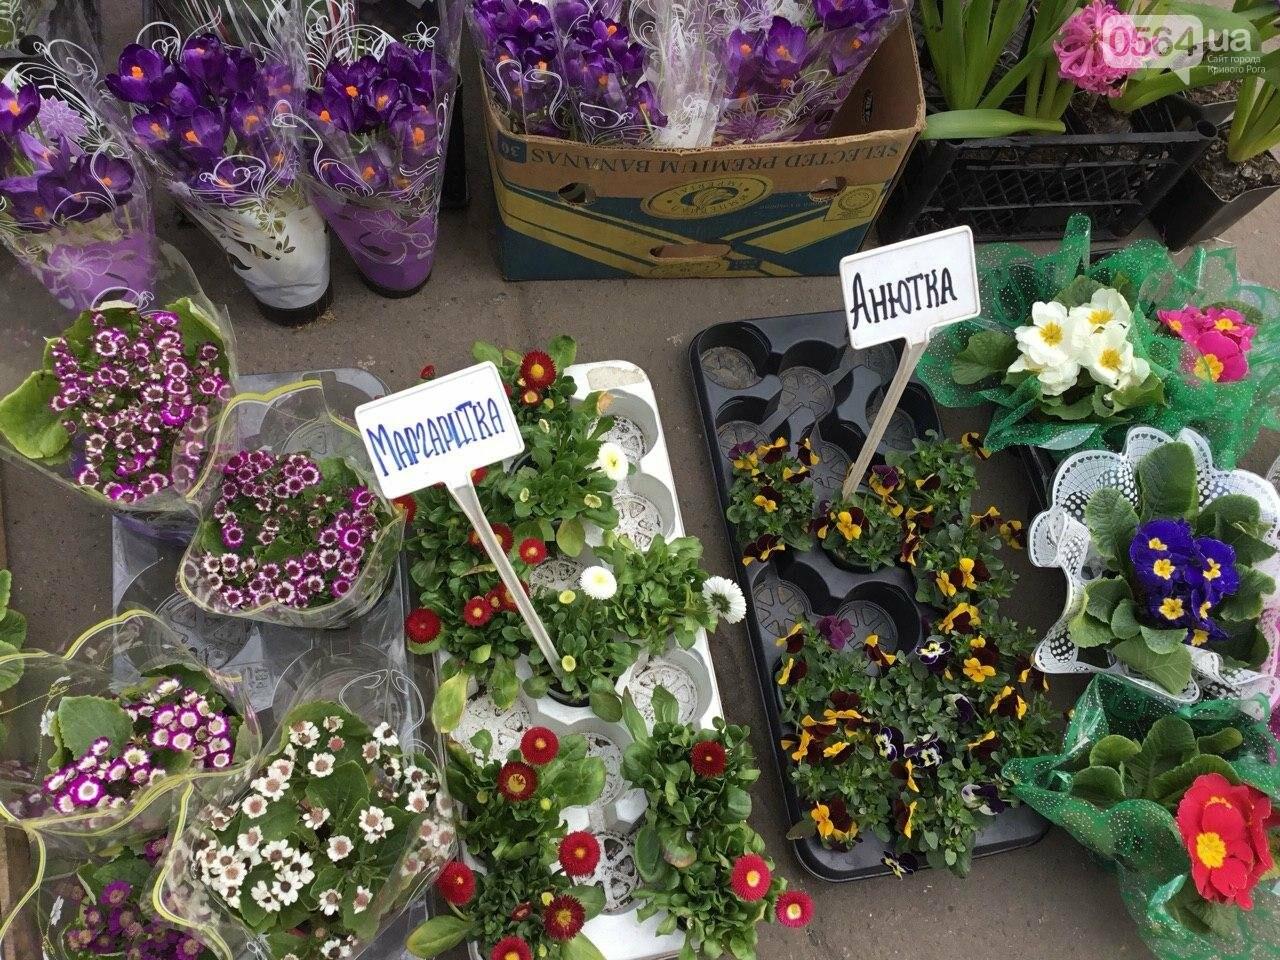 Сколько стоят примула, цикламен, мимоза? Обзор цен на цветы в Кривом Роге, - ФОТО, ВИДЕО, фото-27